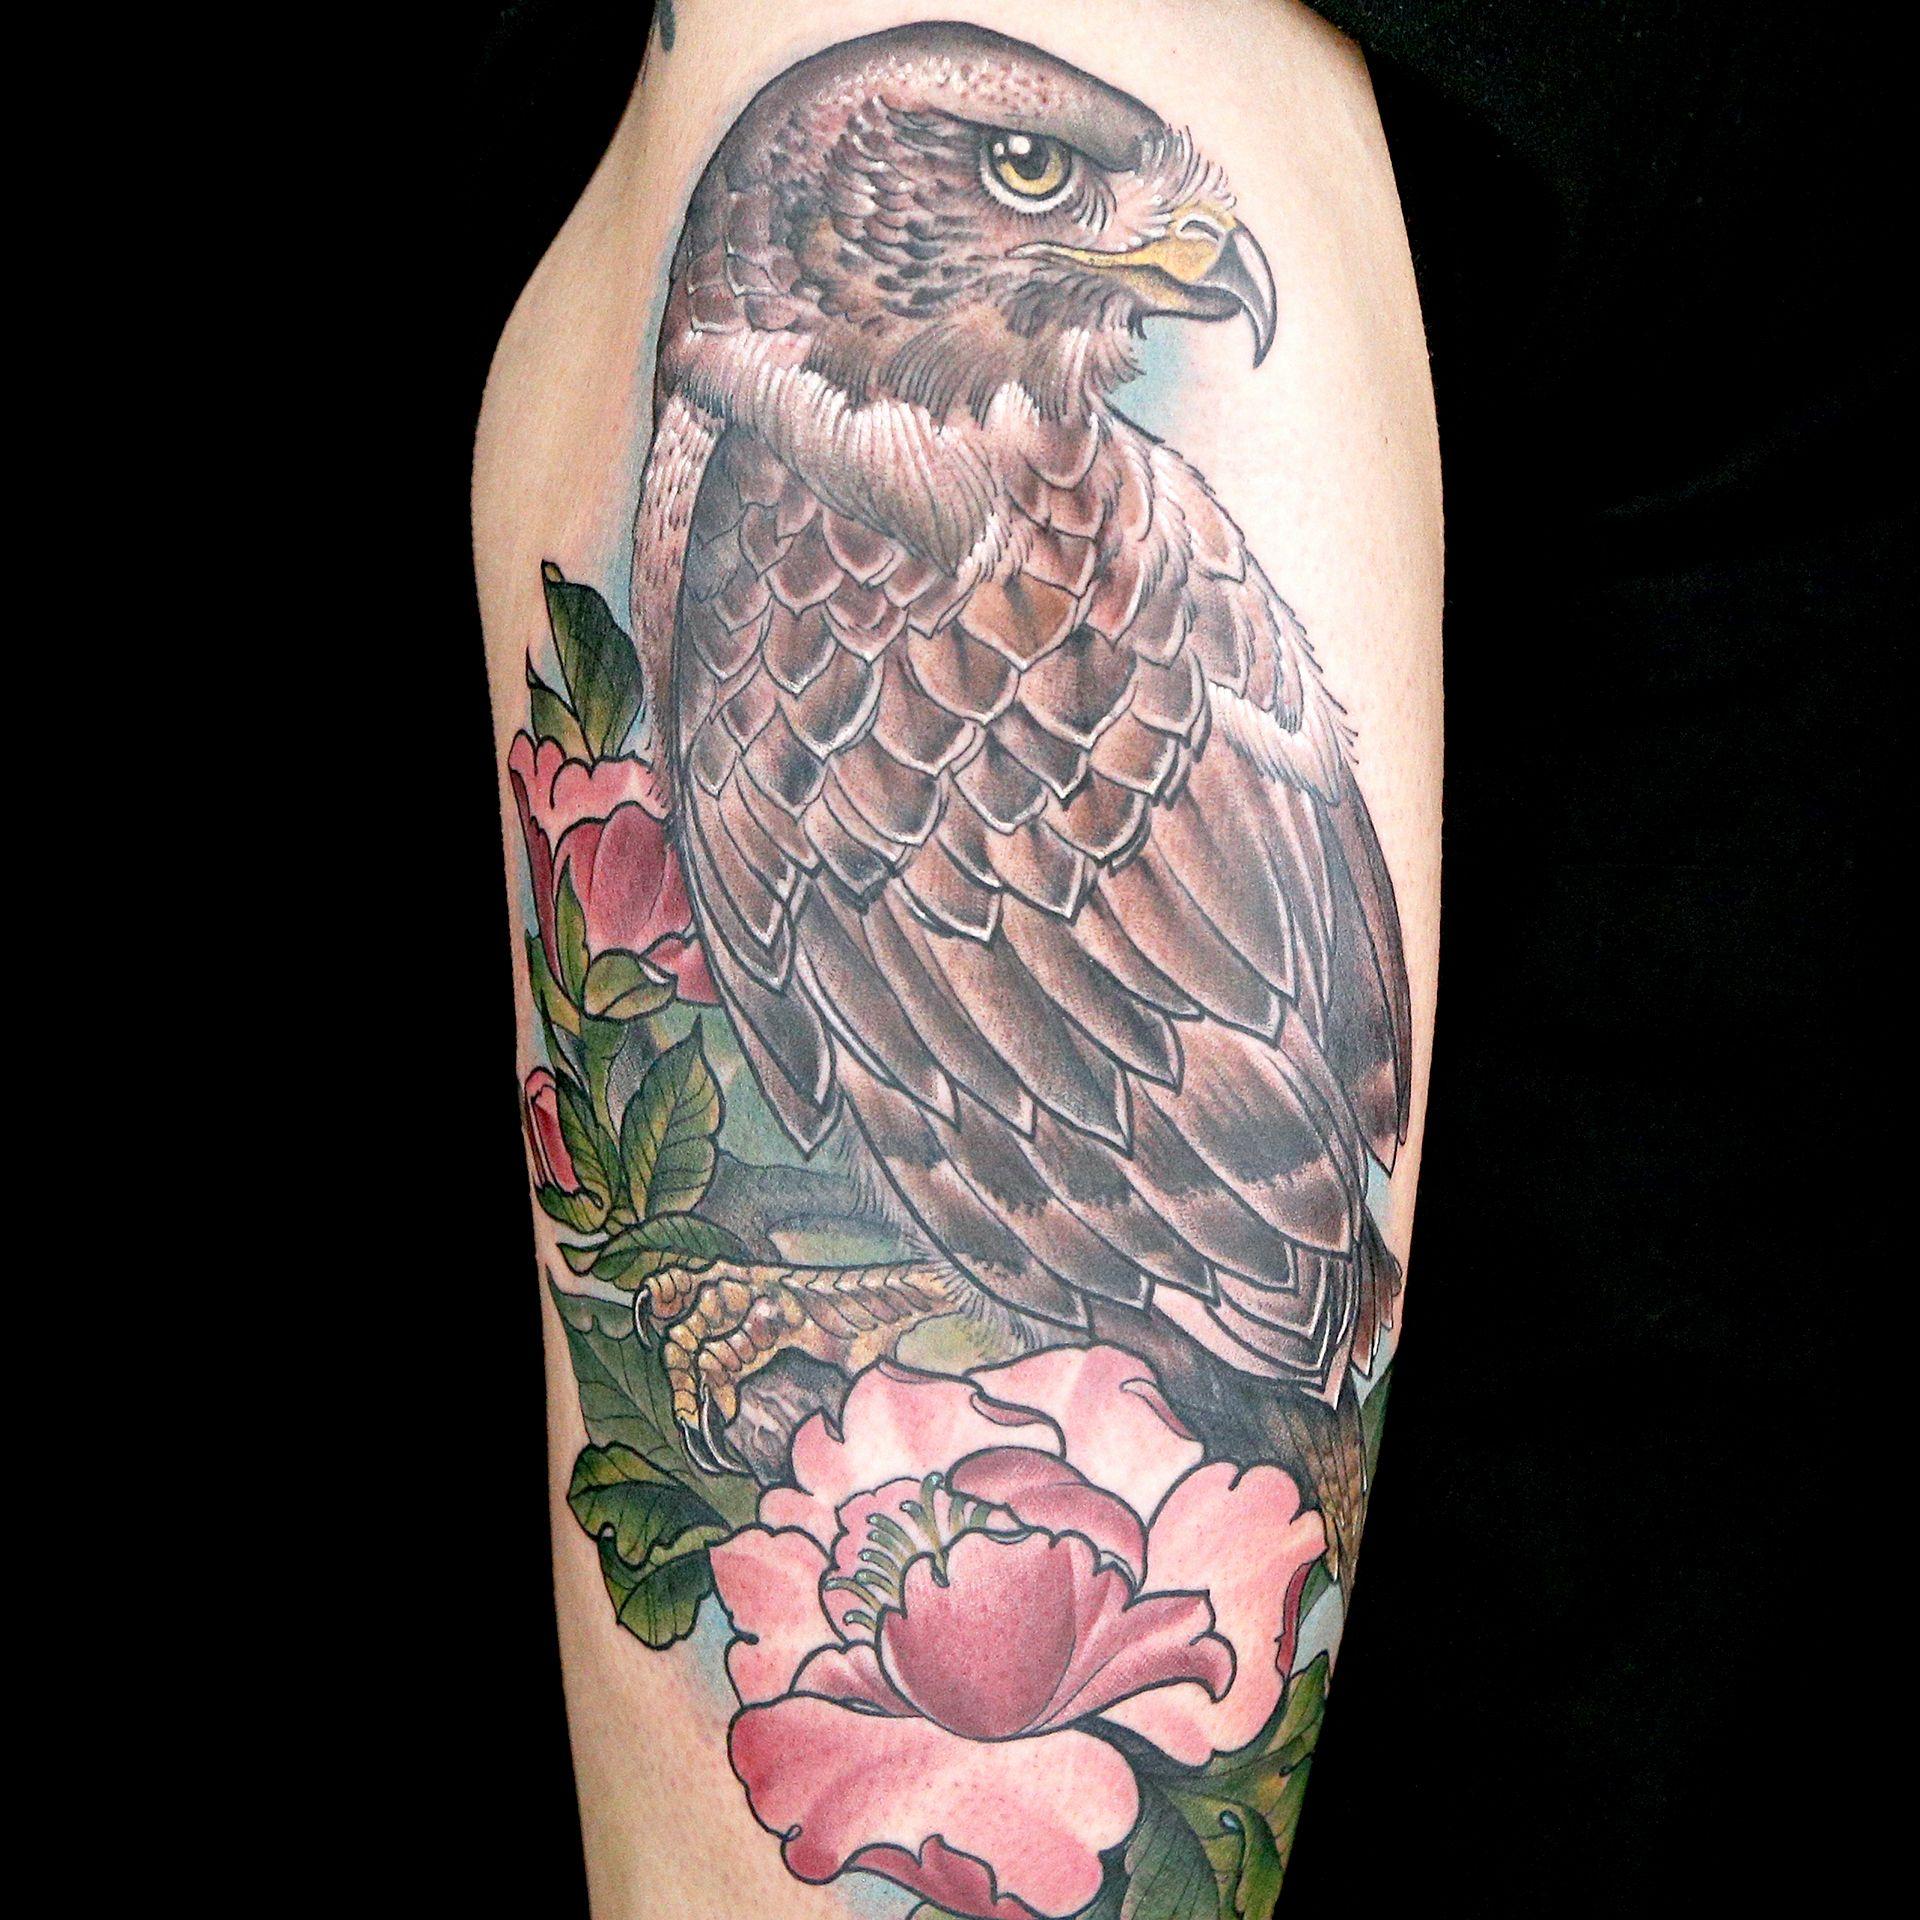 Eagle Tattoo by Artistic Skin Designs (April Nicole & Dane